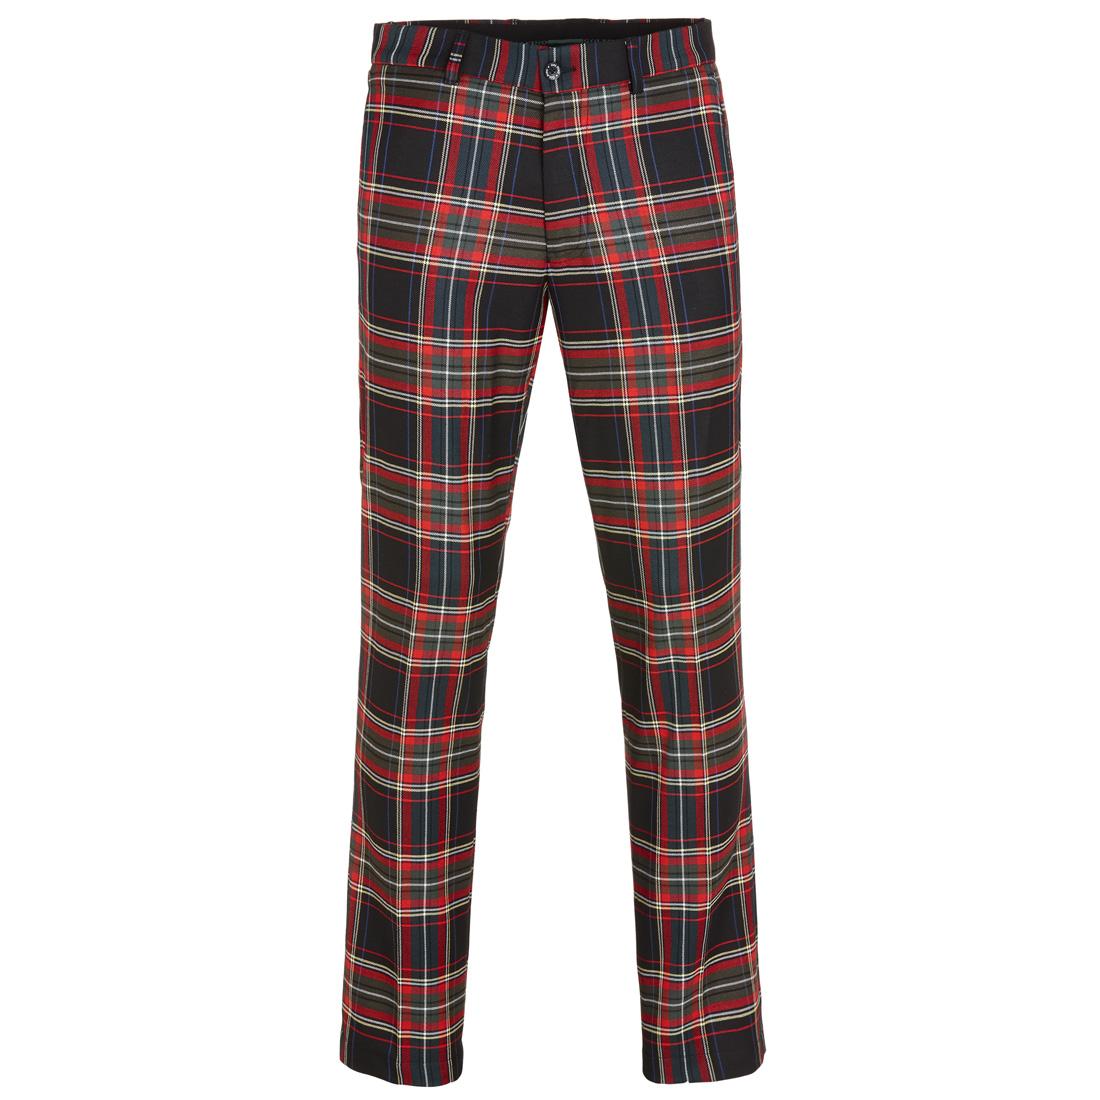 Herren Premium Funktions-Golfhose mit klassischem Karomuster in Slim Fit